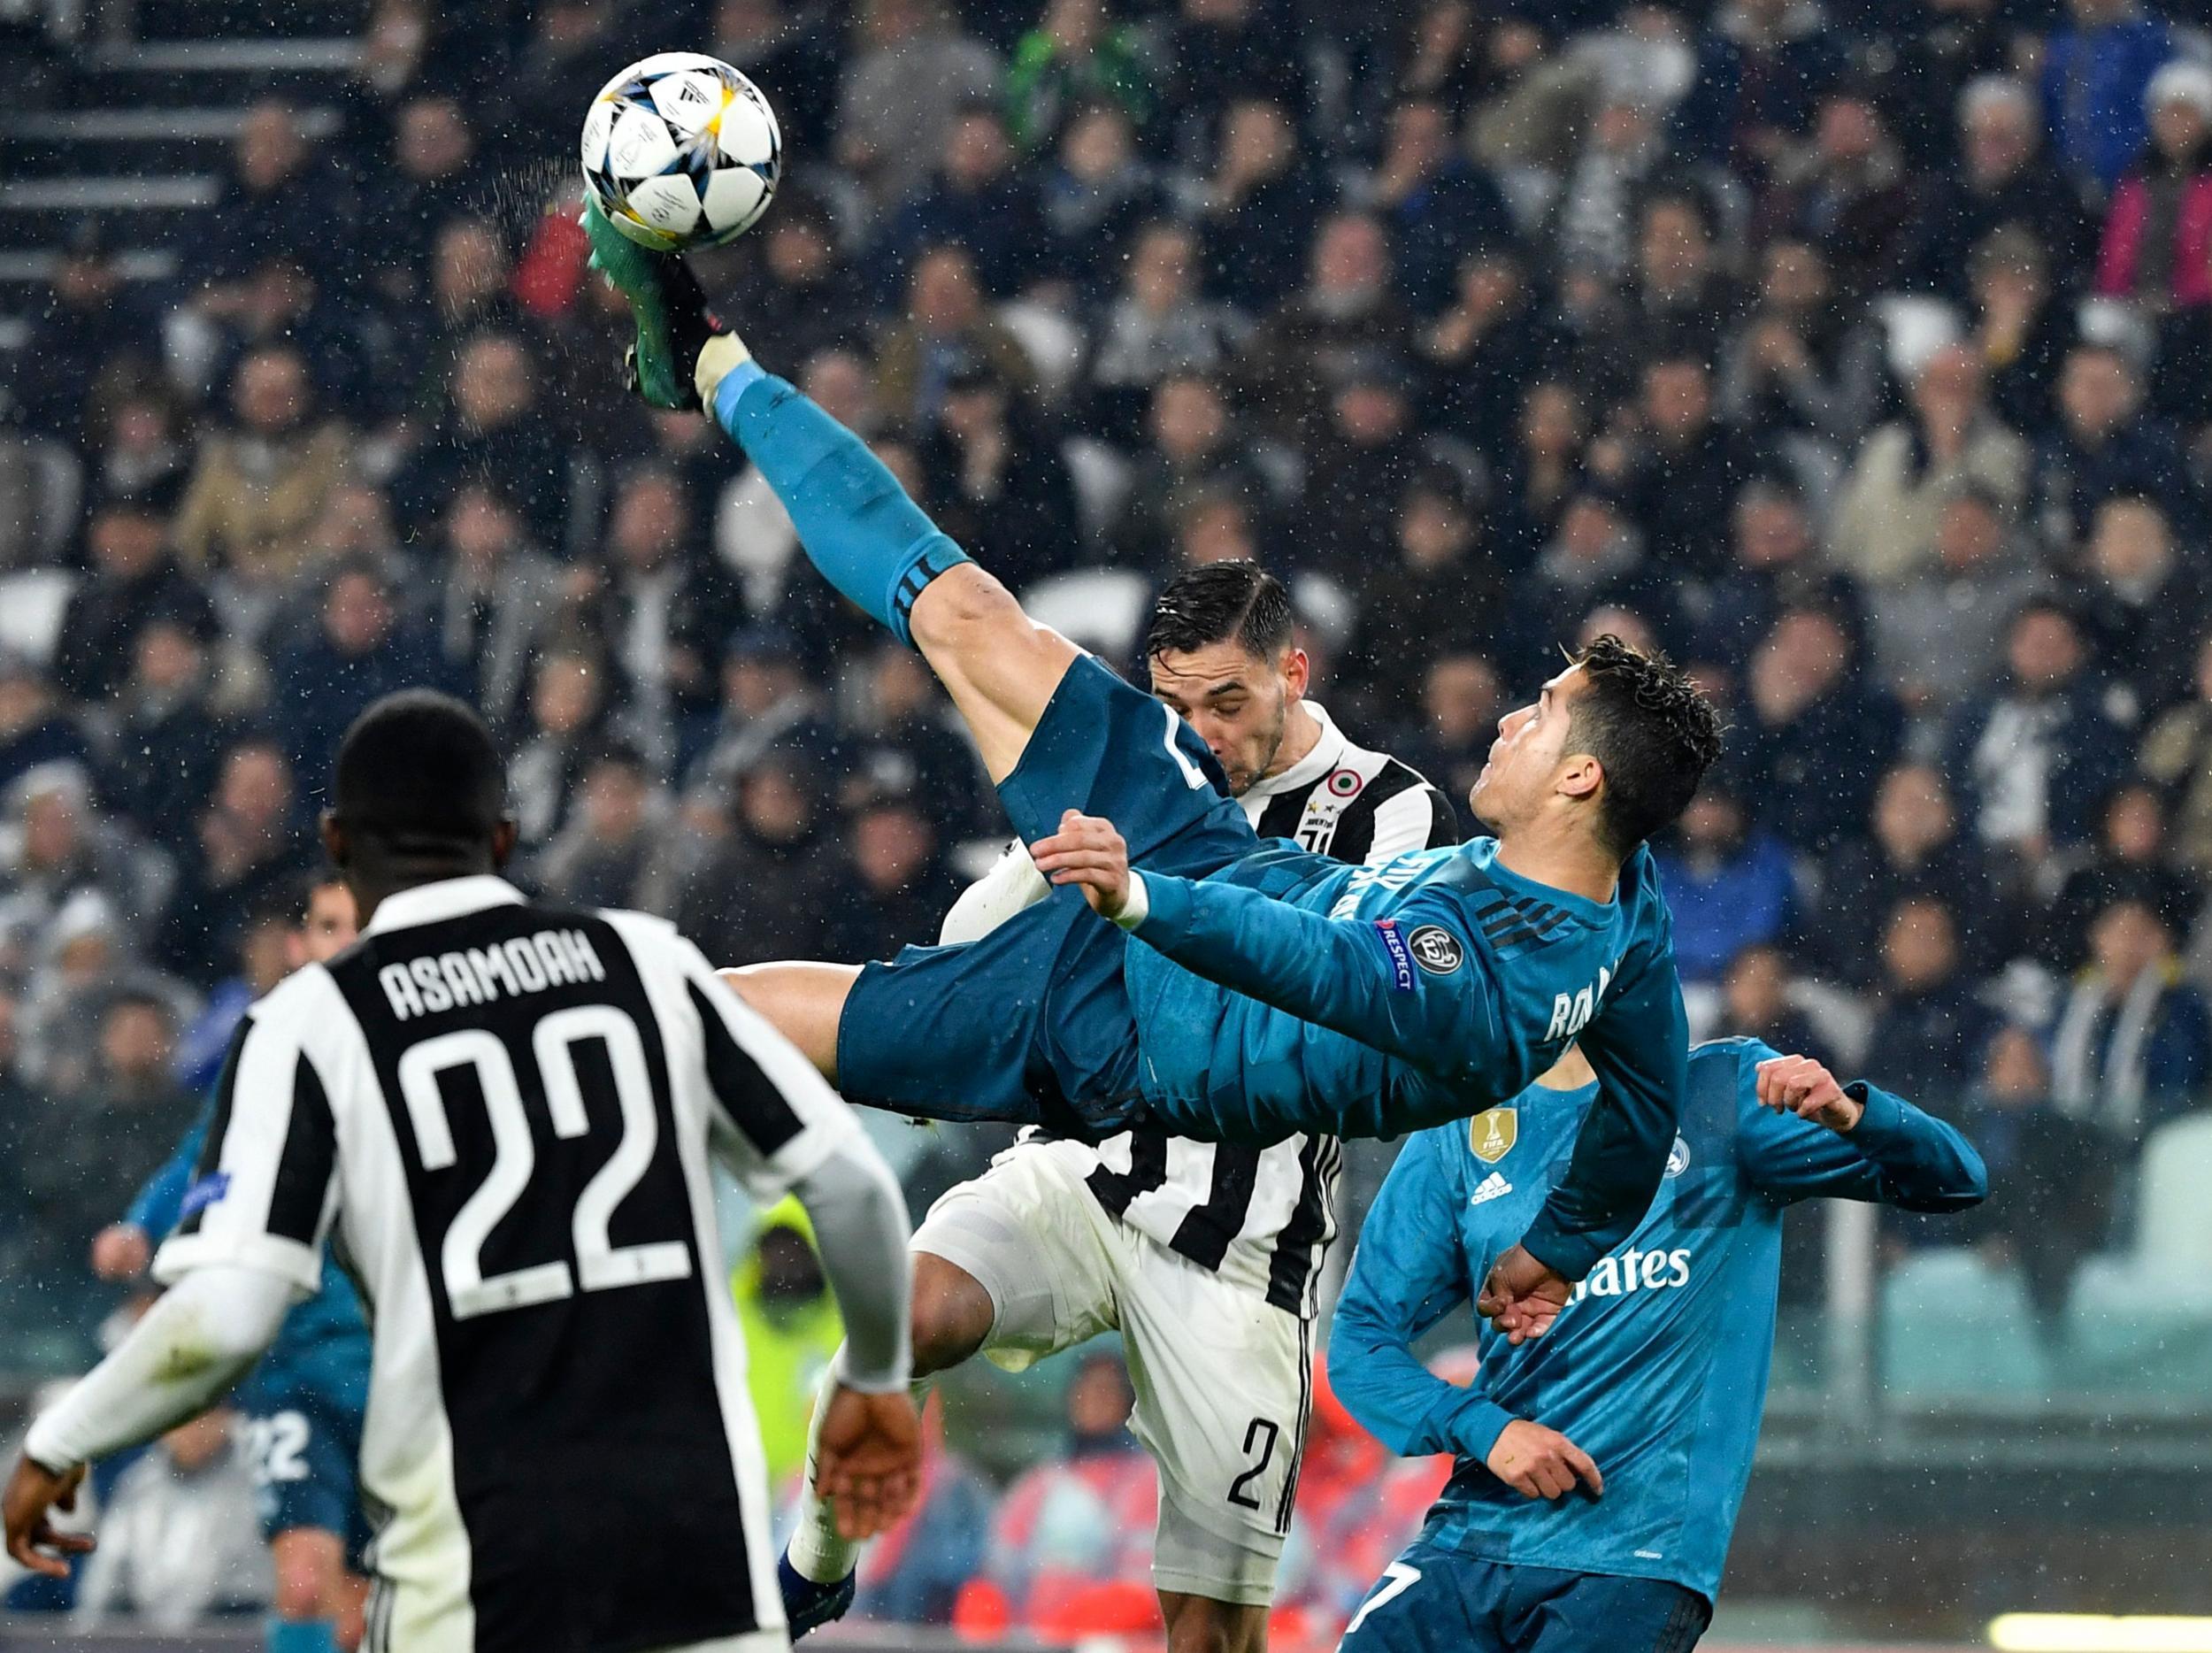 Risultati immagini per Cristiano ronaldo goal Juventus bicycle